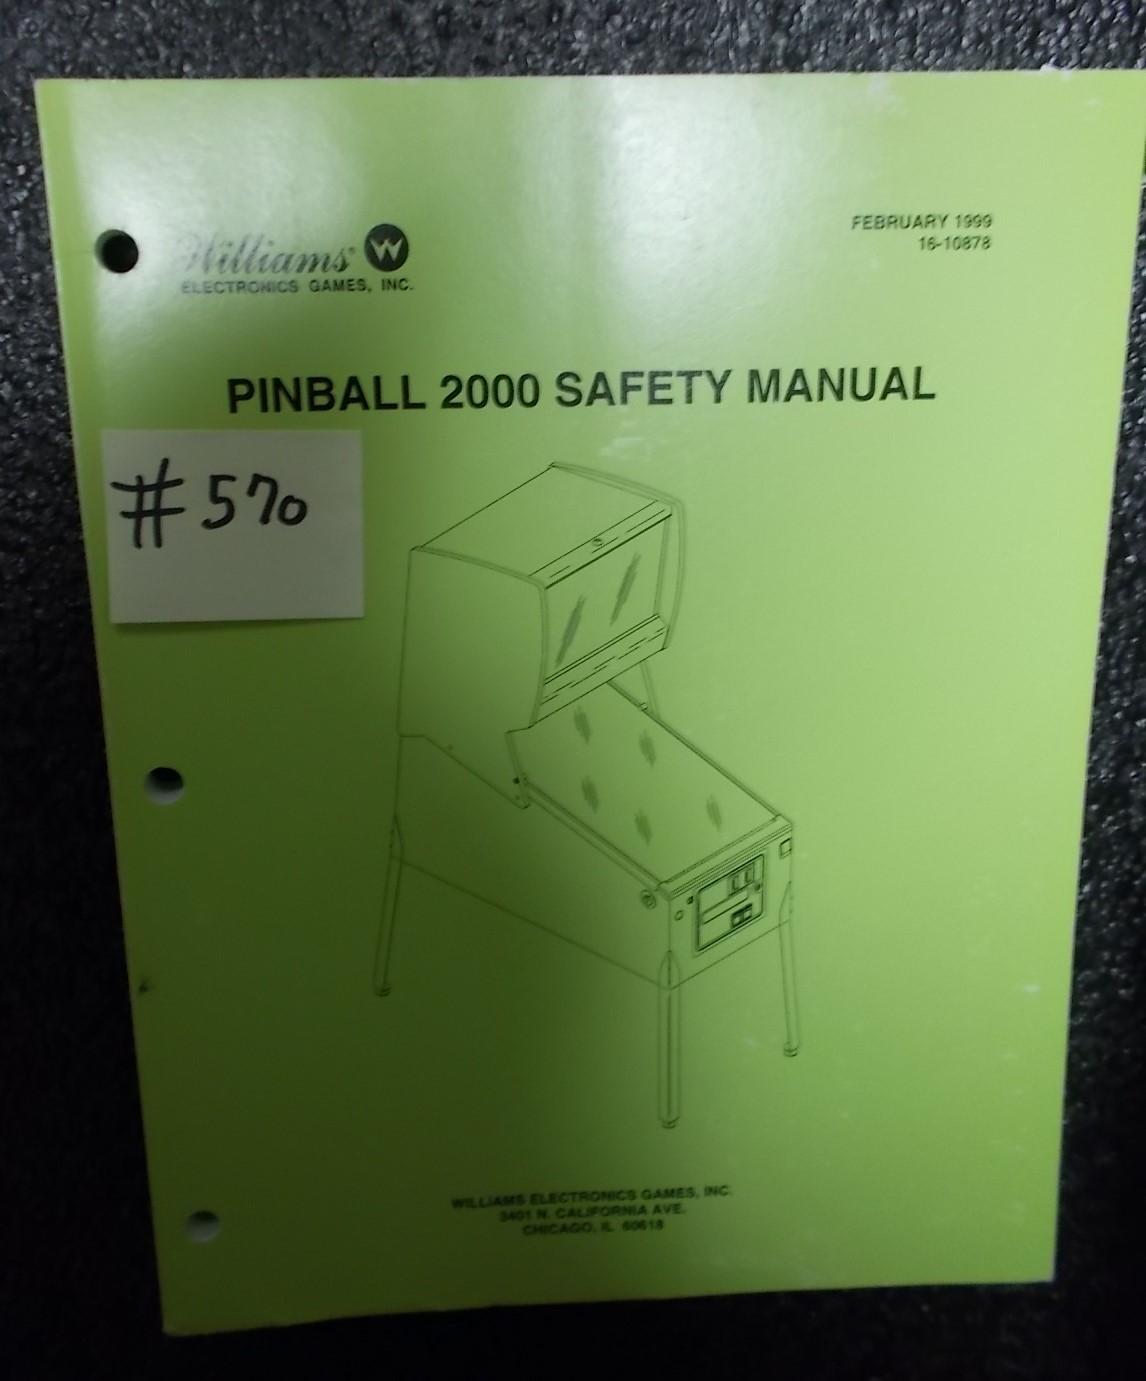 WILLIAMS Pinball Machine Game PINBALL 2000 SAFETY MANUAL #570 for